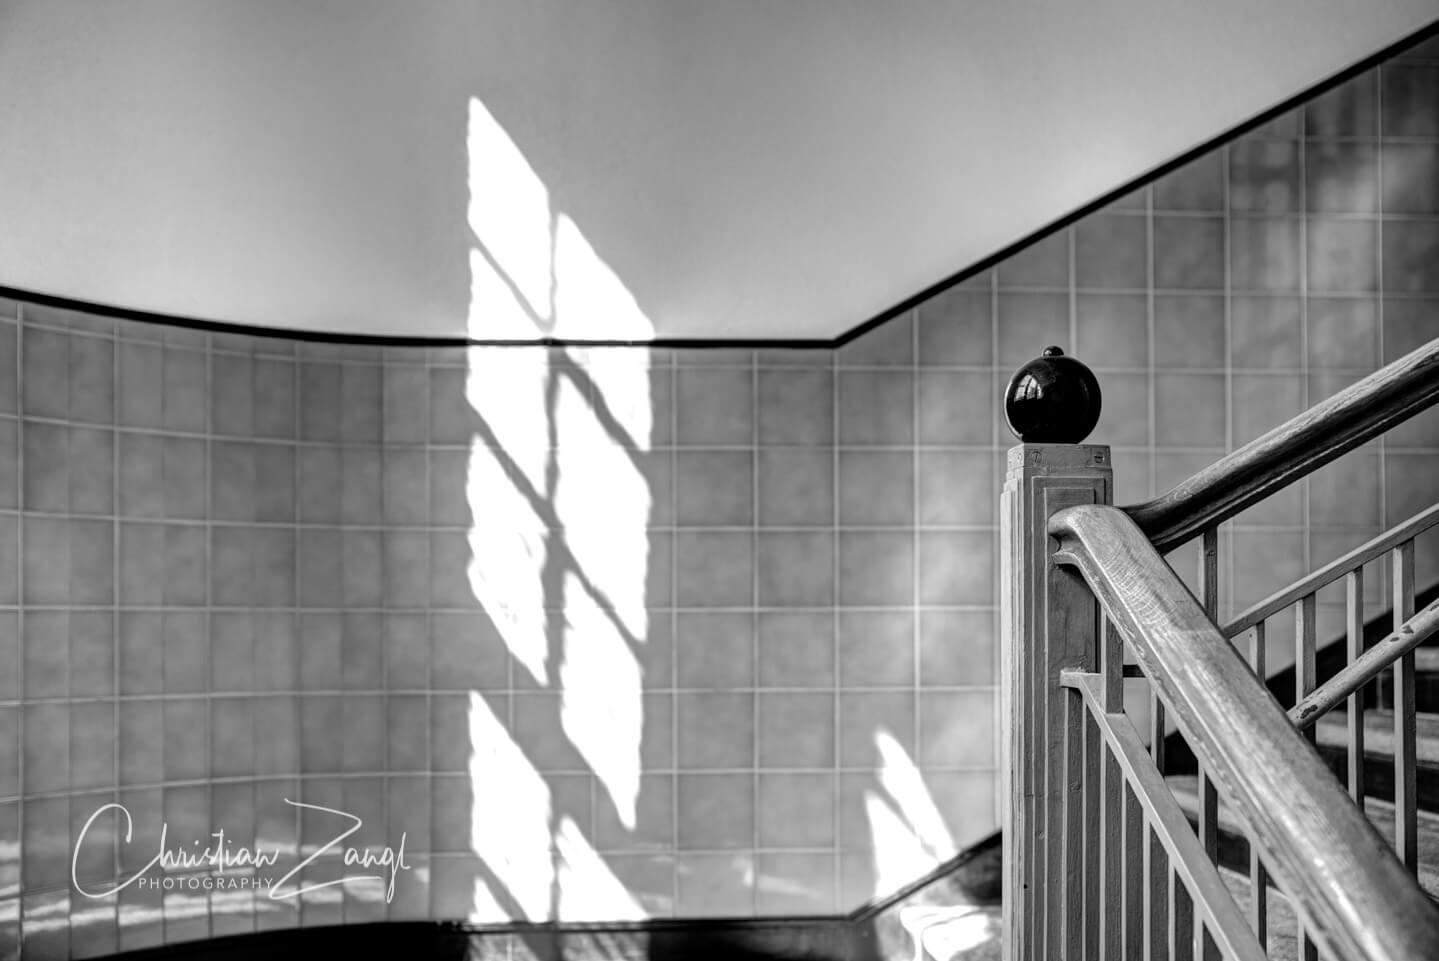 Sommersonne im Treppenhaus